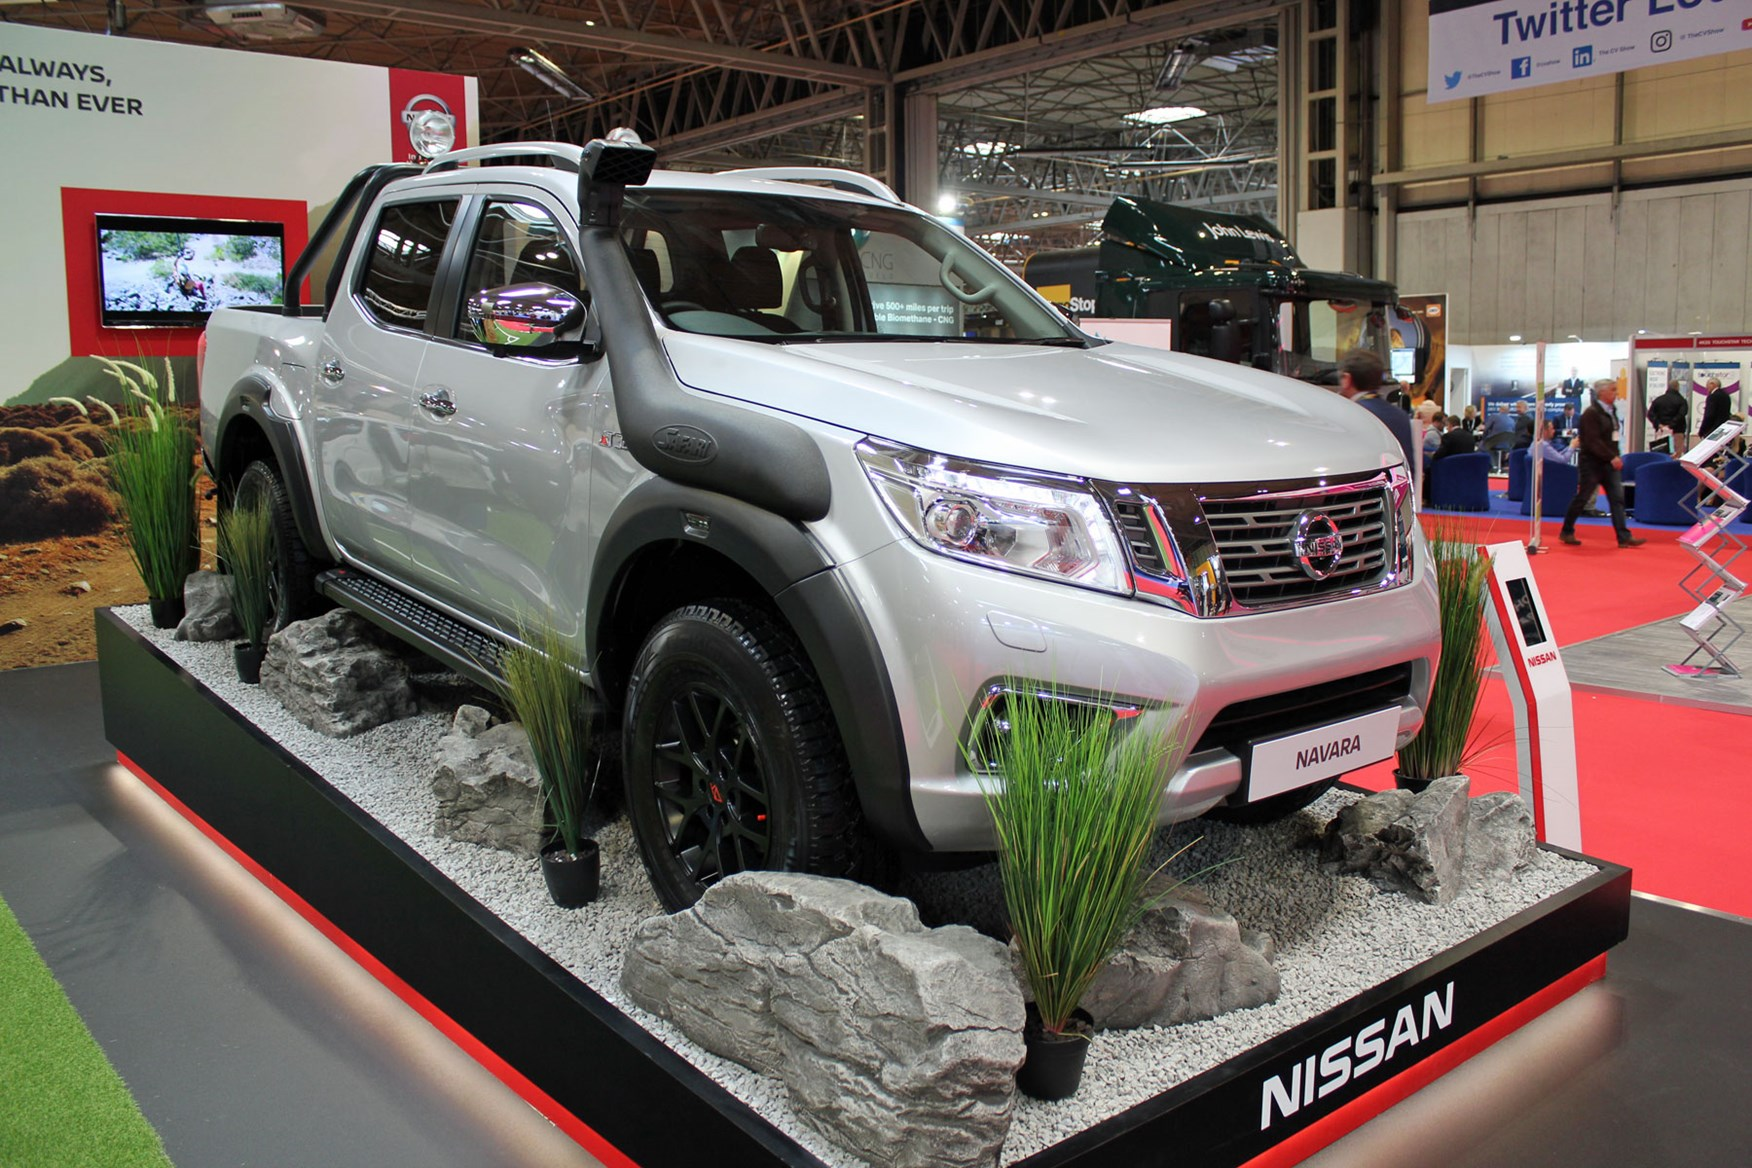 new nissan navara off roader at32 pickup world debut at cv. Black Bedroom Furniture Sets. Home Design Ideas